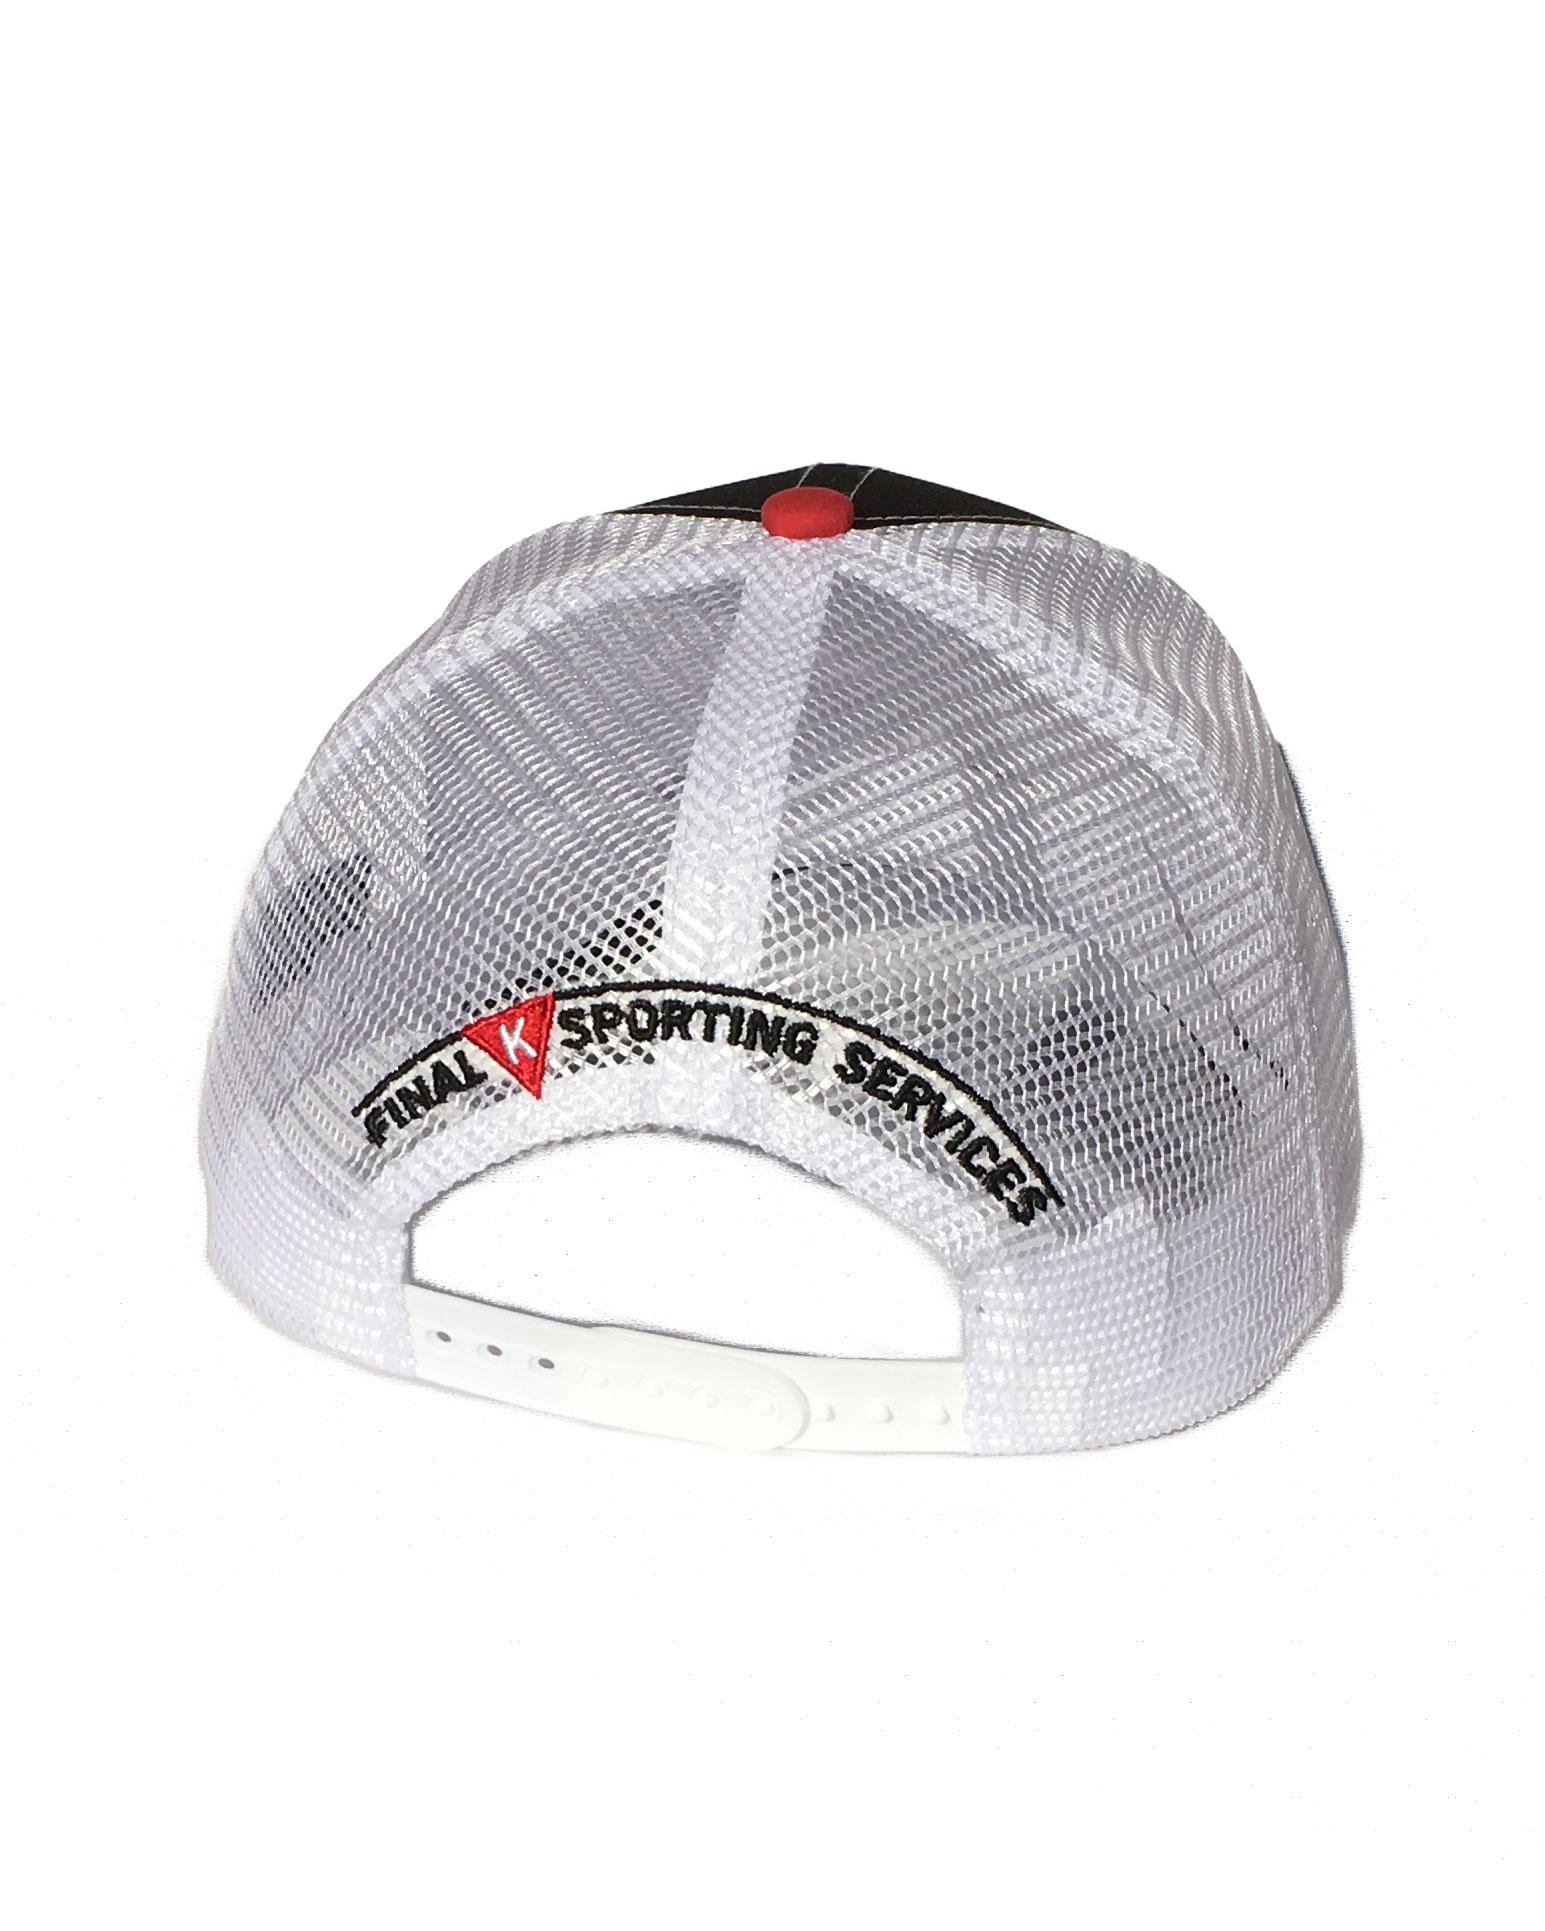 4e7240c0d BOCO Embroidered Technical Trucker Hat